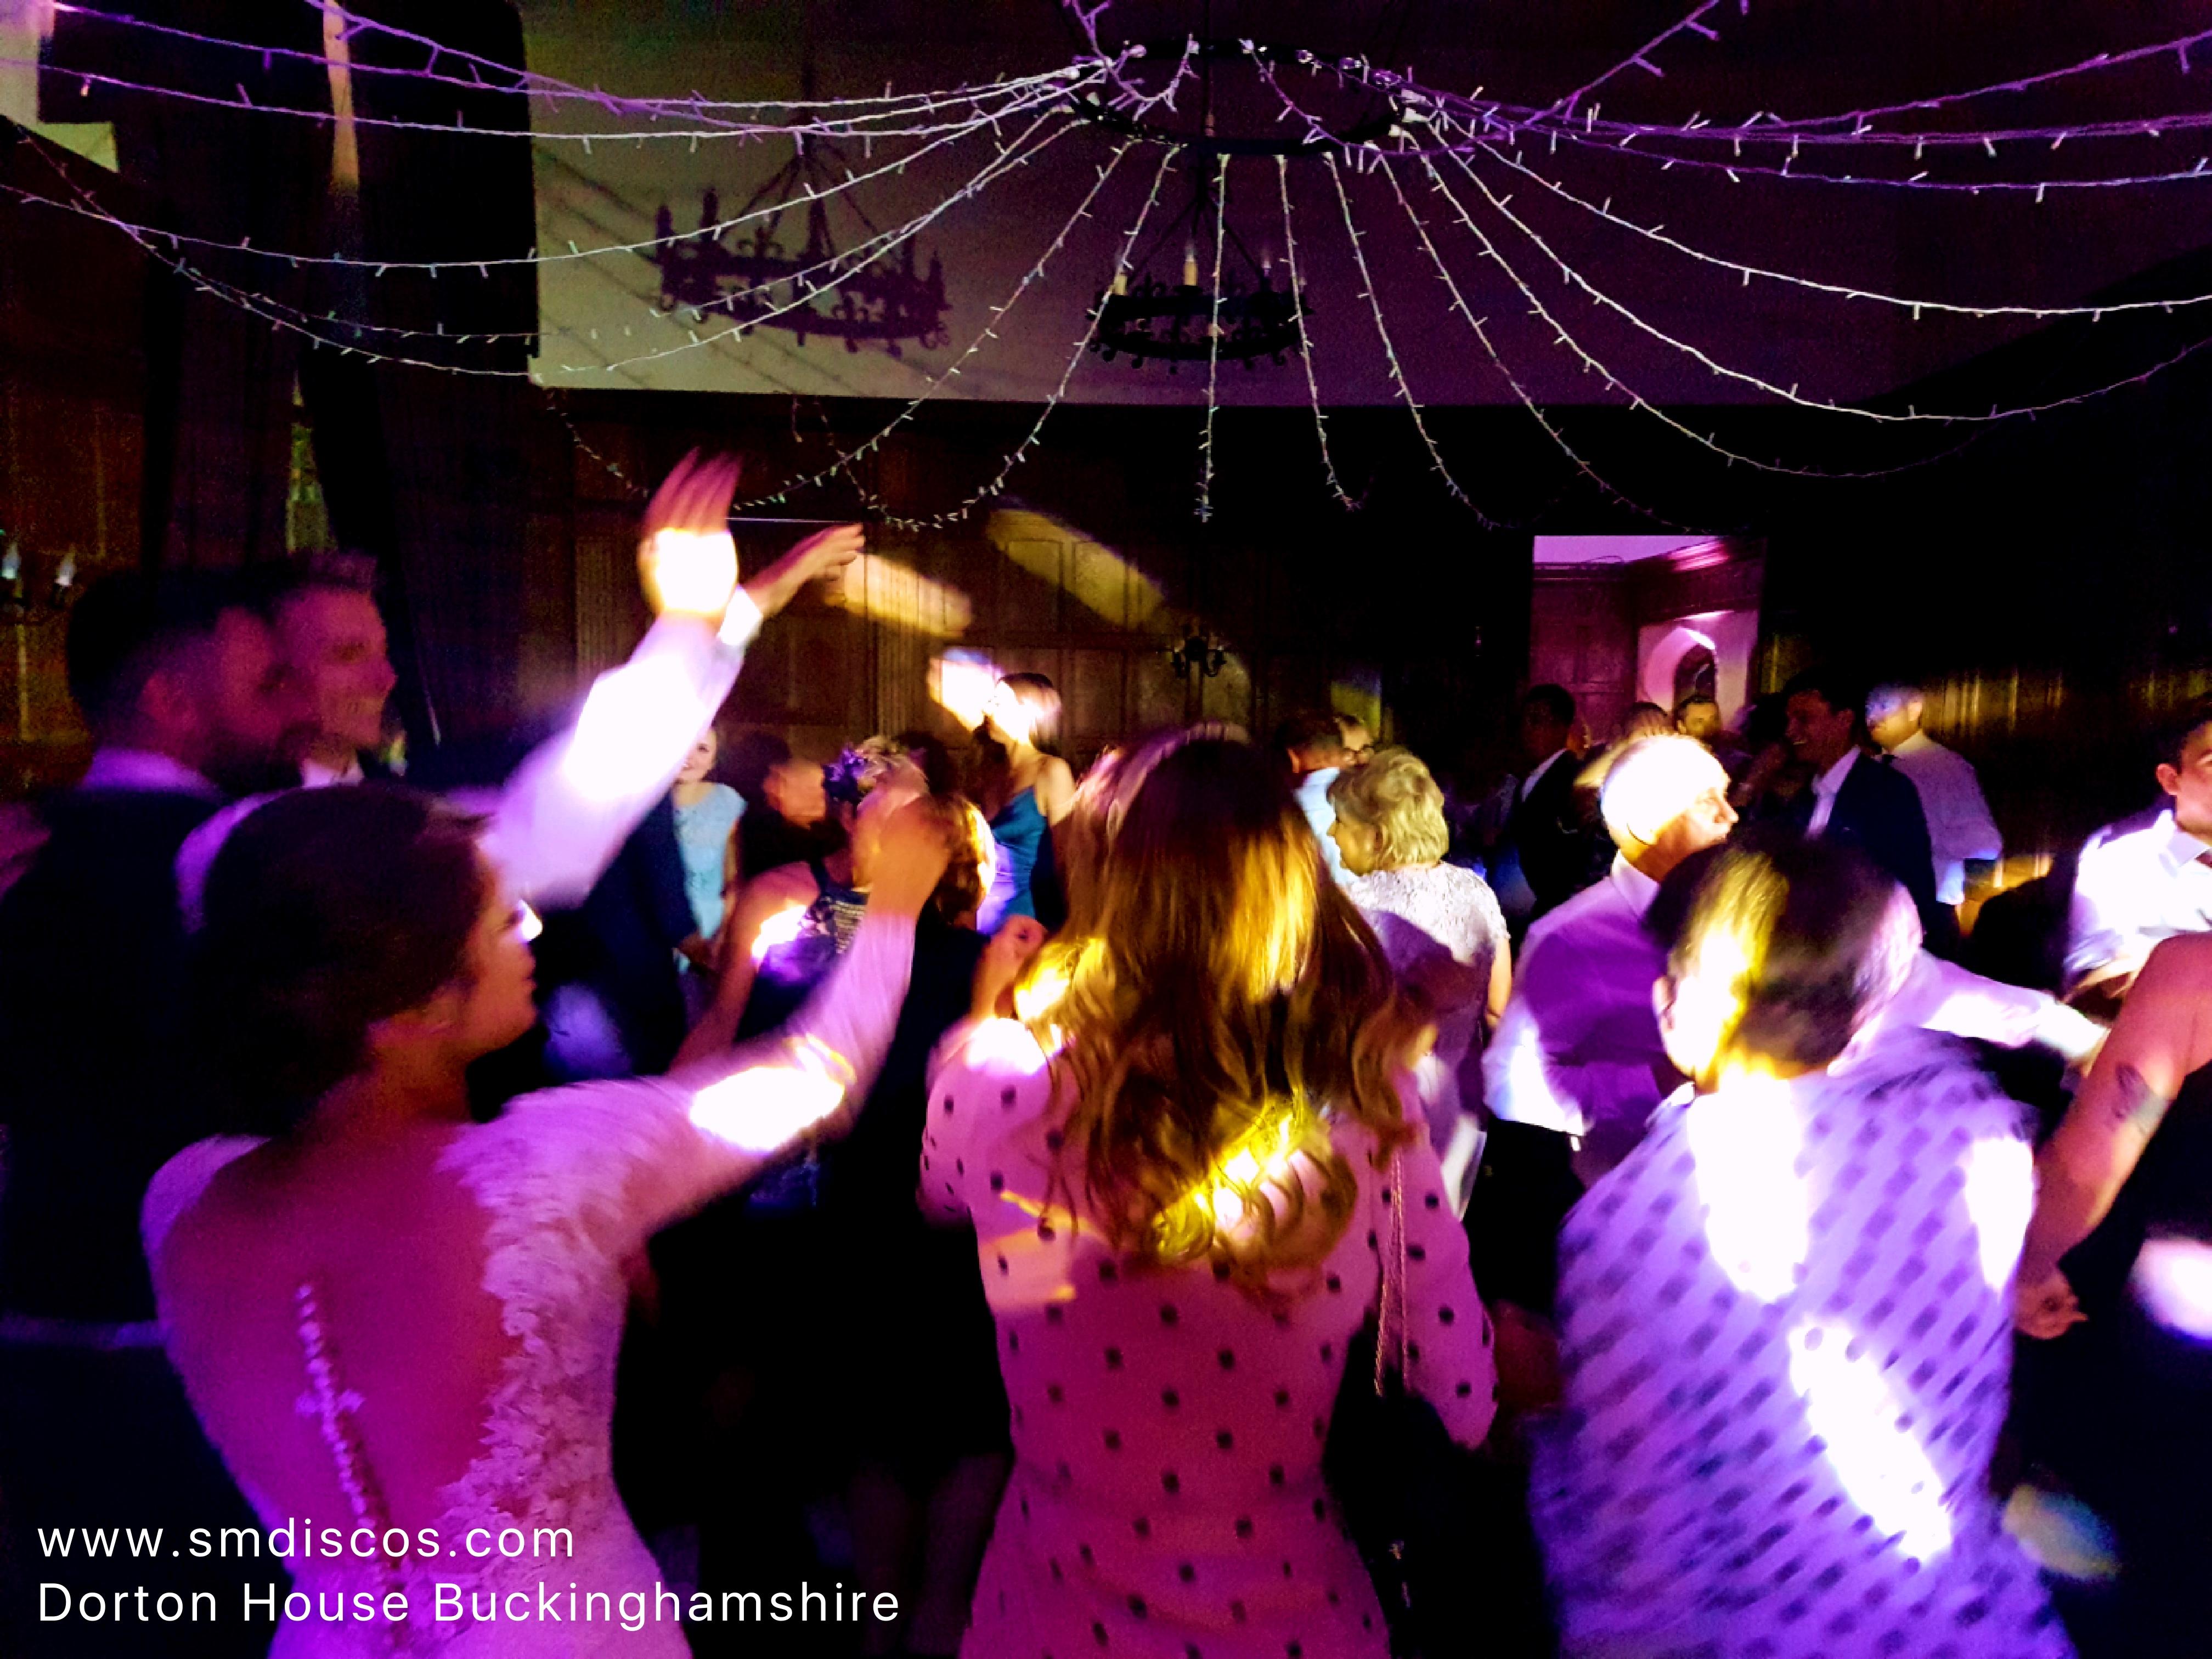 Wedding DJ party at Dorton House